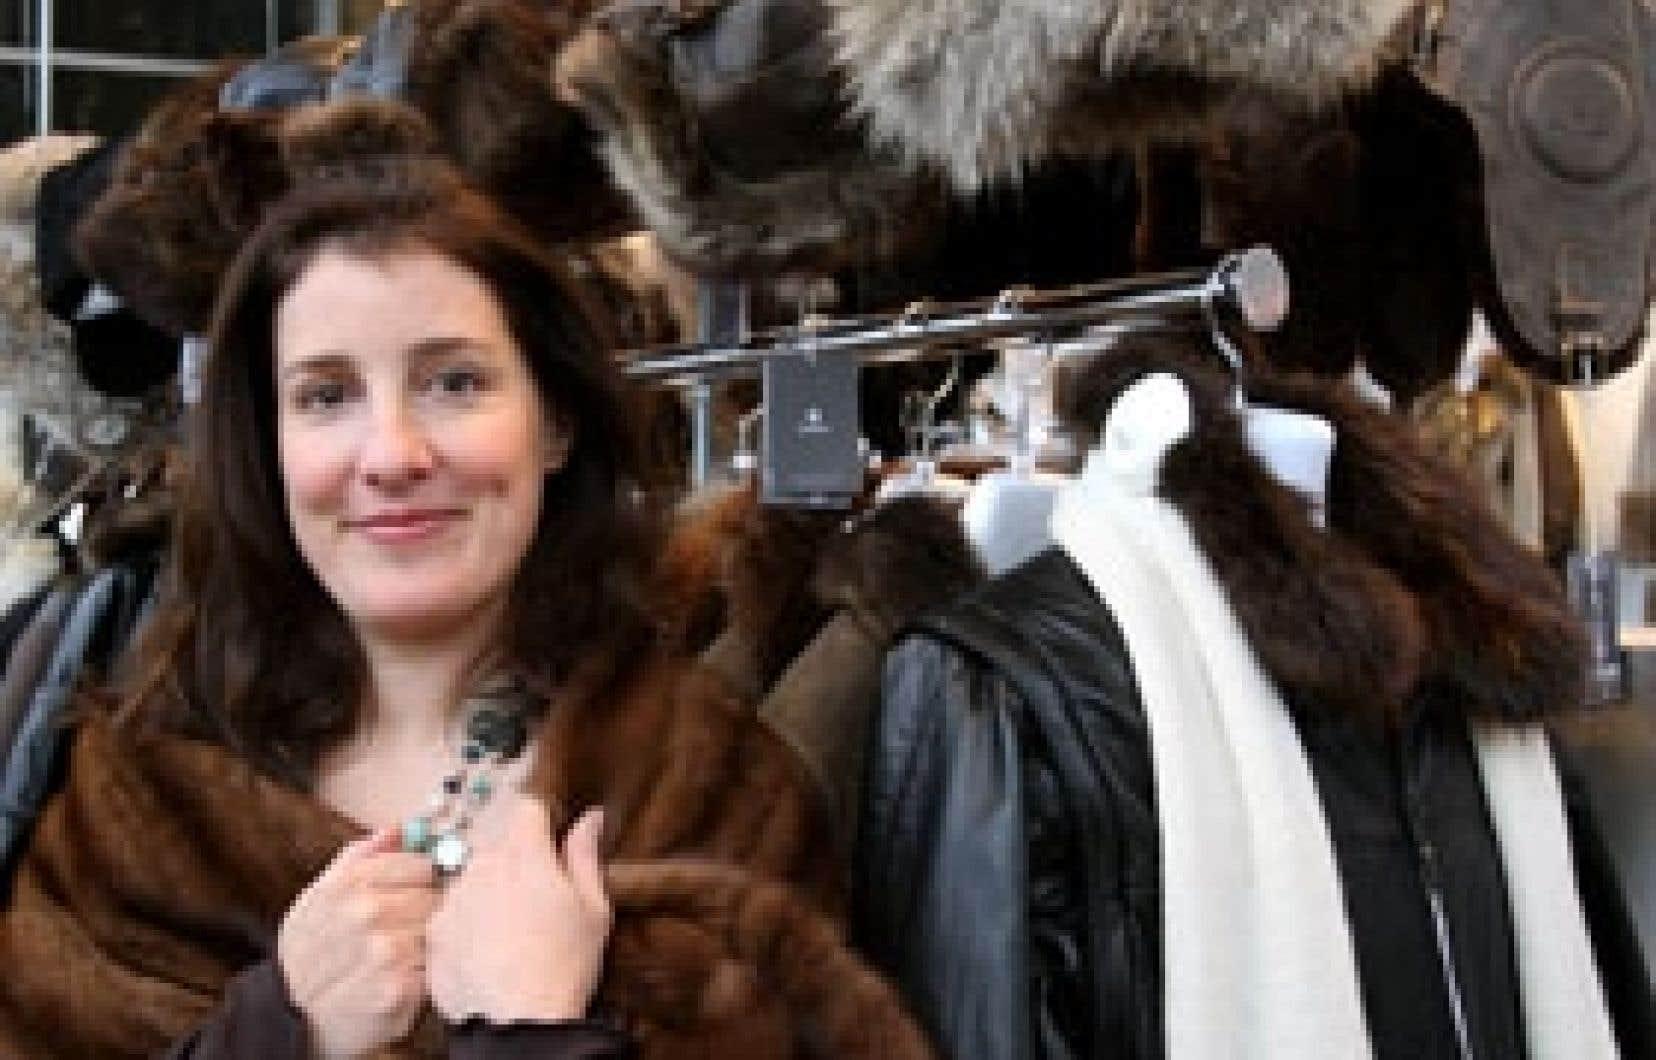 Bon an, mal an, Mariouche Gagné recycle avec Harricana au moins 5000 manteaux de fourrure.